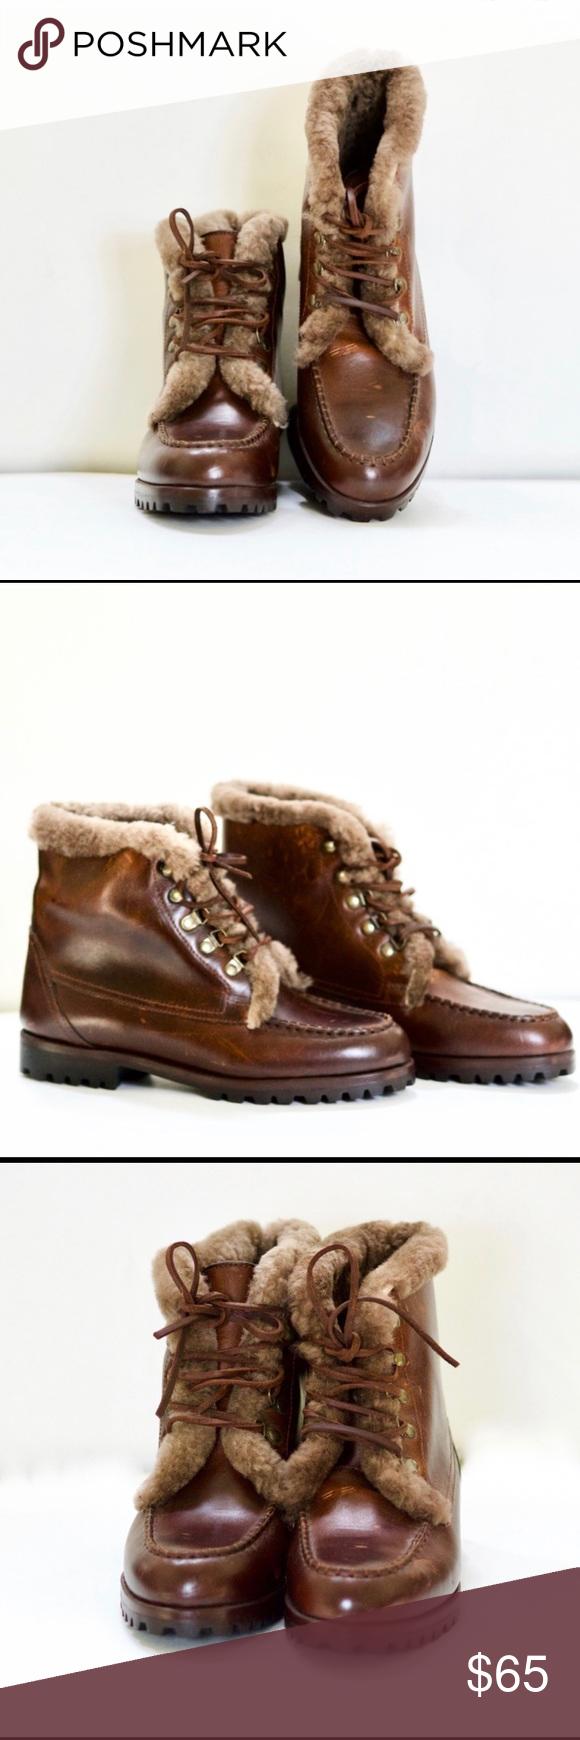 Vintage Cole Haan Fur Lined Leather